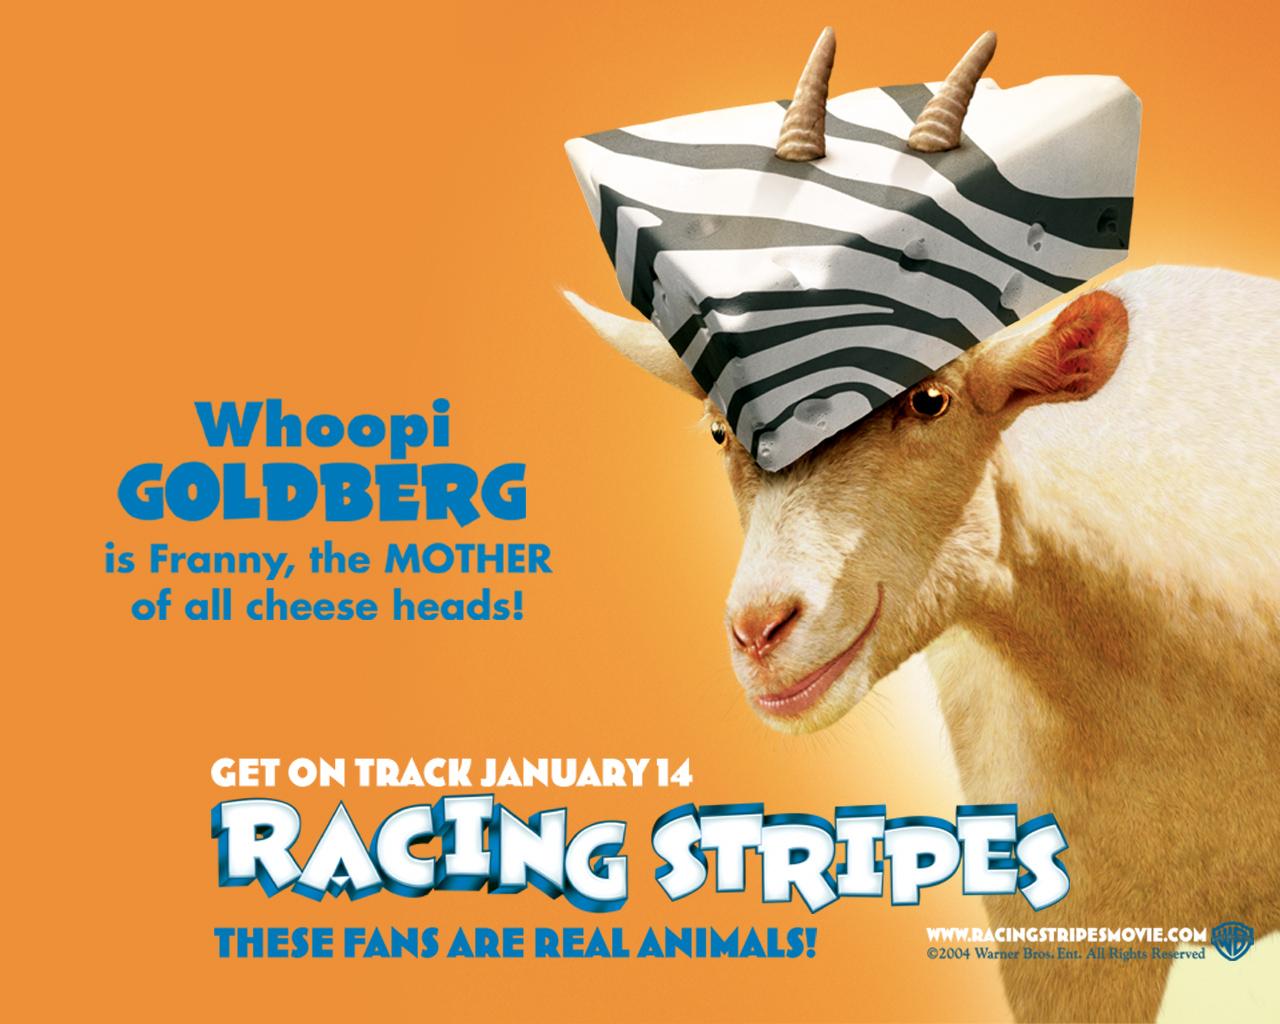 racing stripes 005